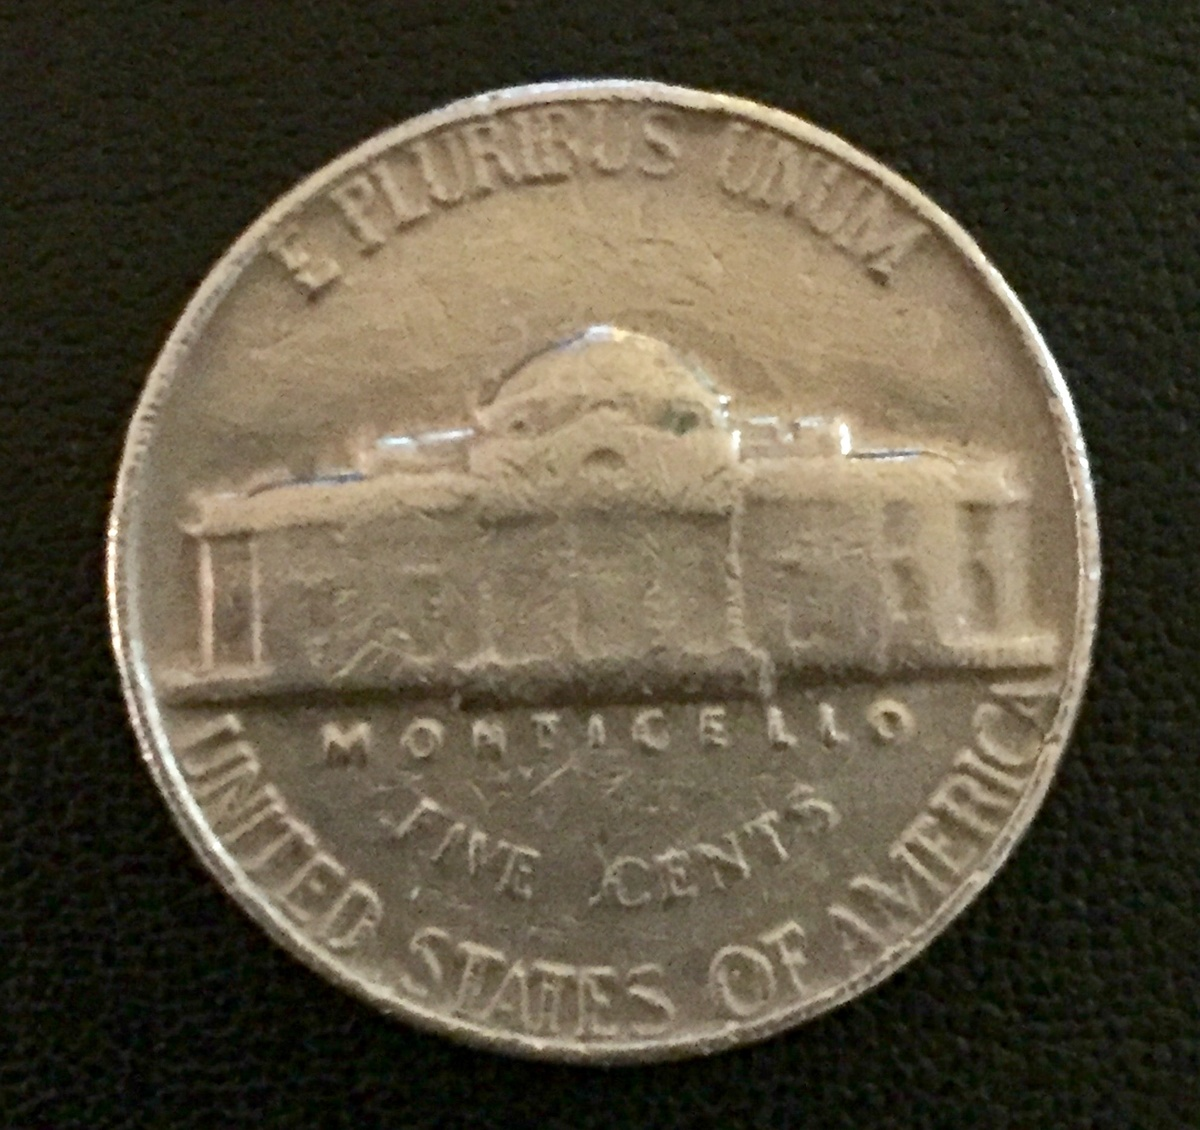 1964 Jefferson Nickel no mint mark need information   Collectors Weekly